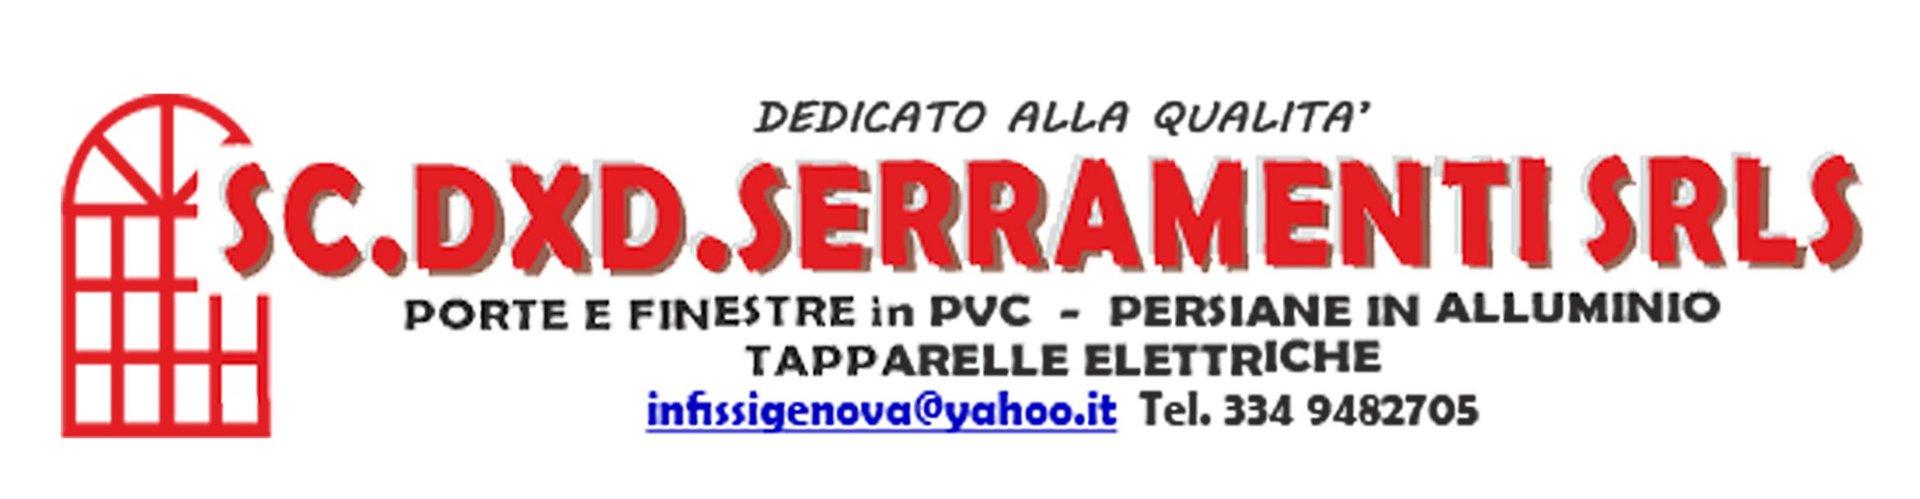 SC.DXD. SERRAMENTI-LOGO